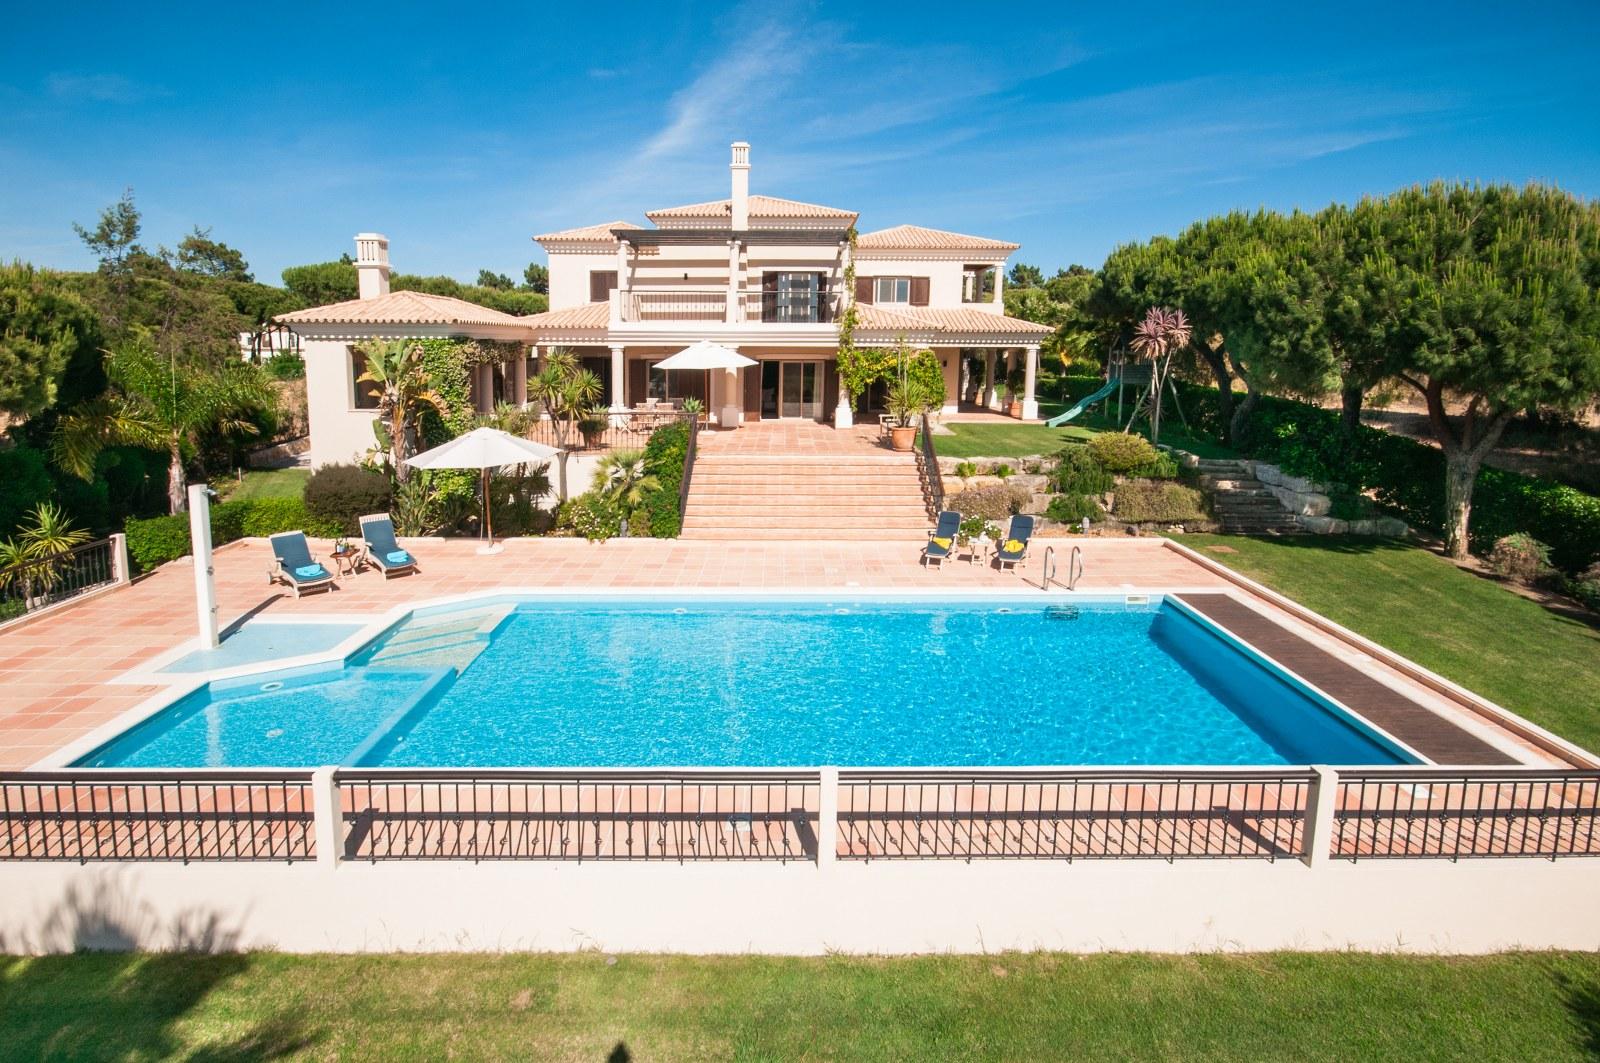 spain resort villa with swimming pool